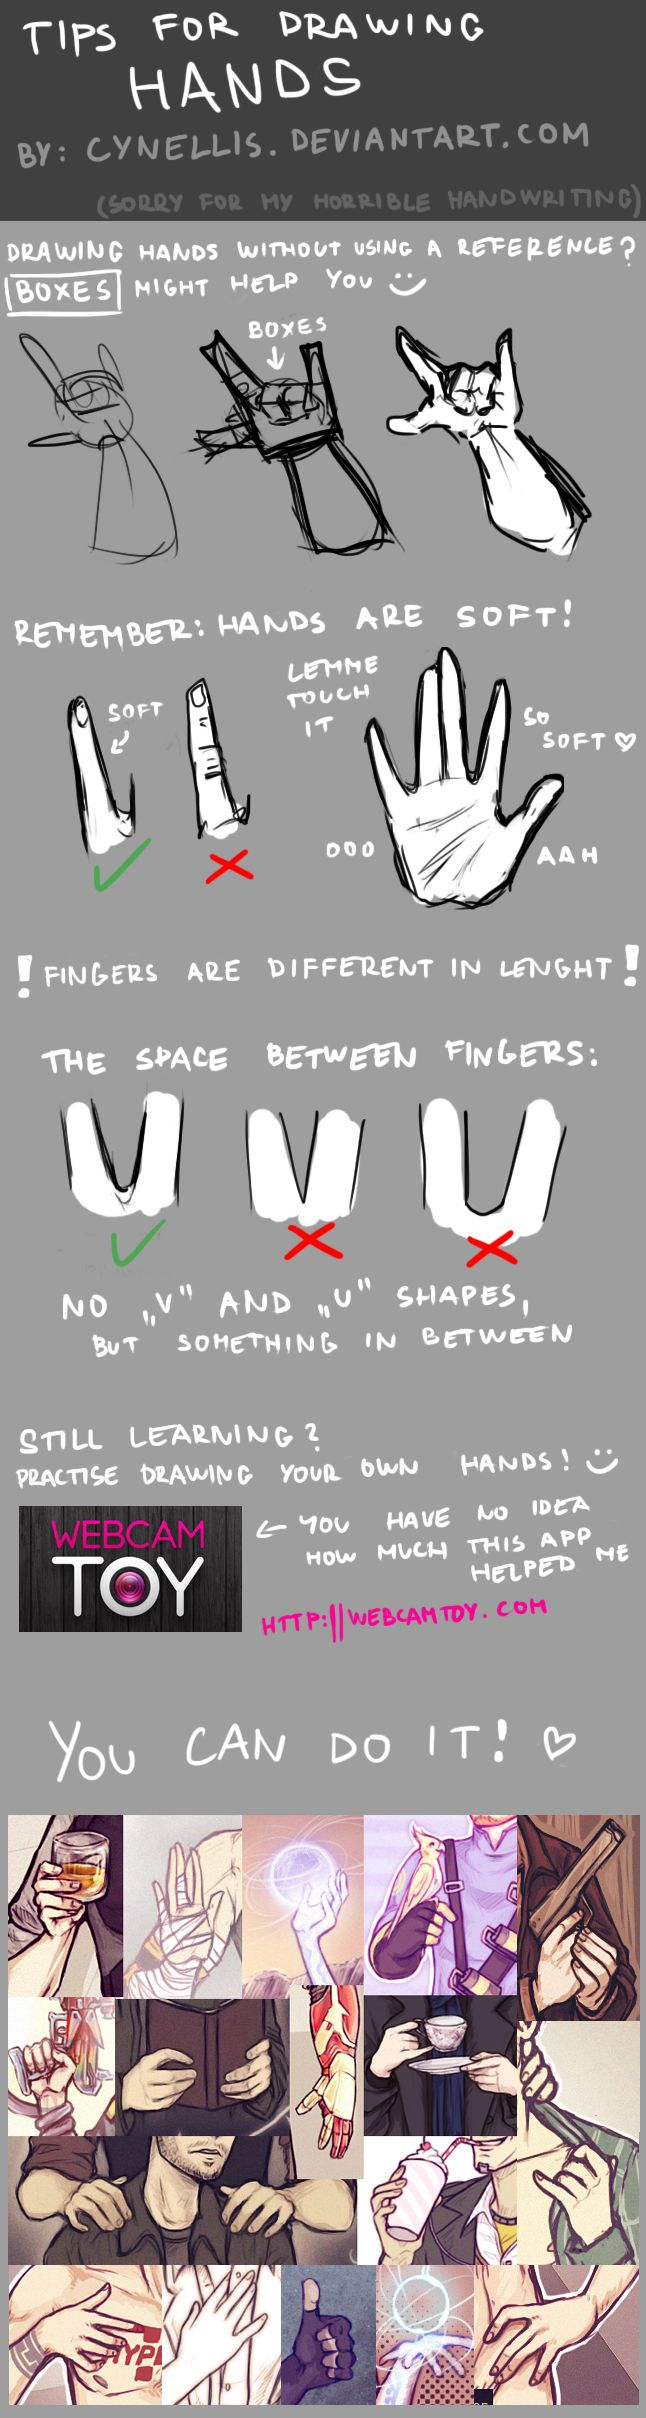 TIPS FOR DRAWING HANDS by cynellis.deviantart.com on @deviantART . Sketch / Drawing Illustration Inspiration